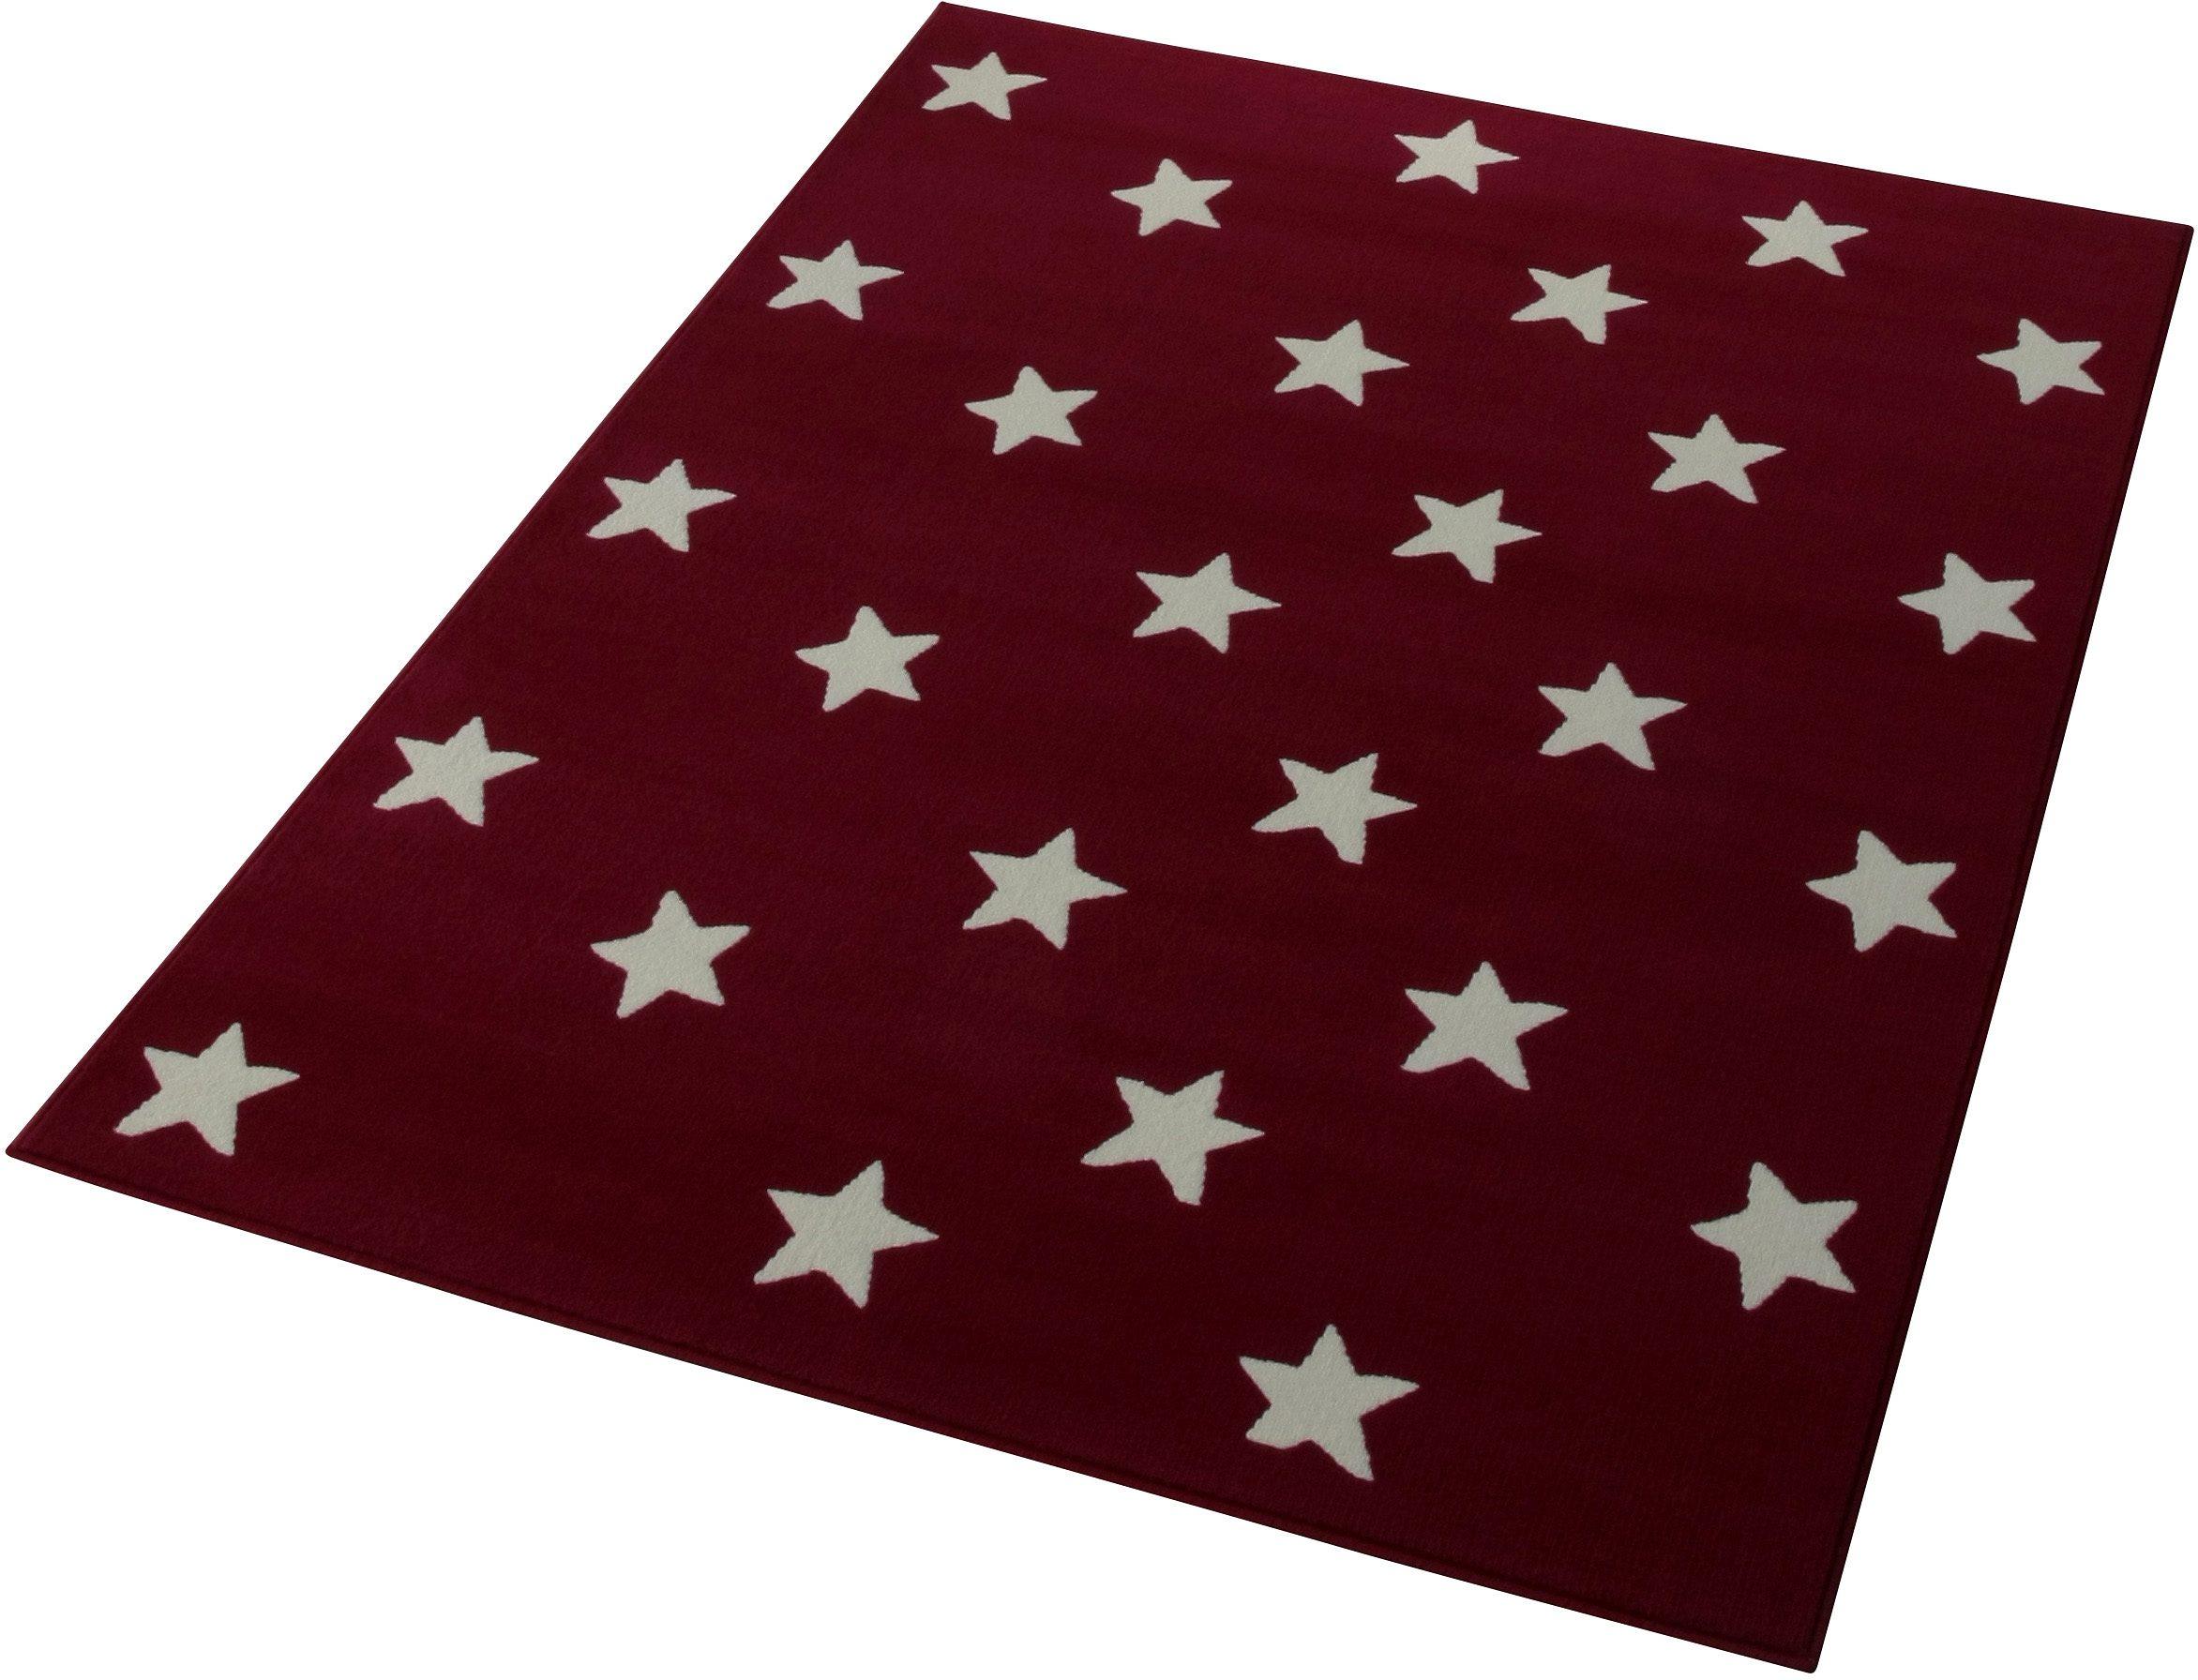 Teppich Stars HANSE Home rechteckig Höhe 9 mm maschinell getuftet